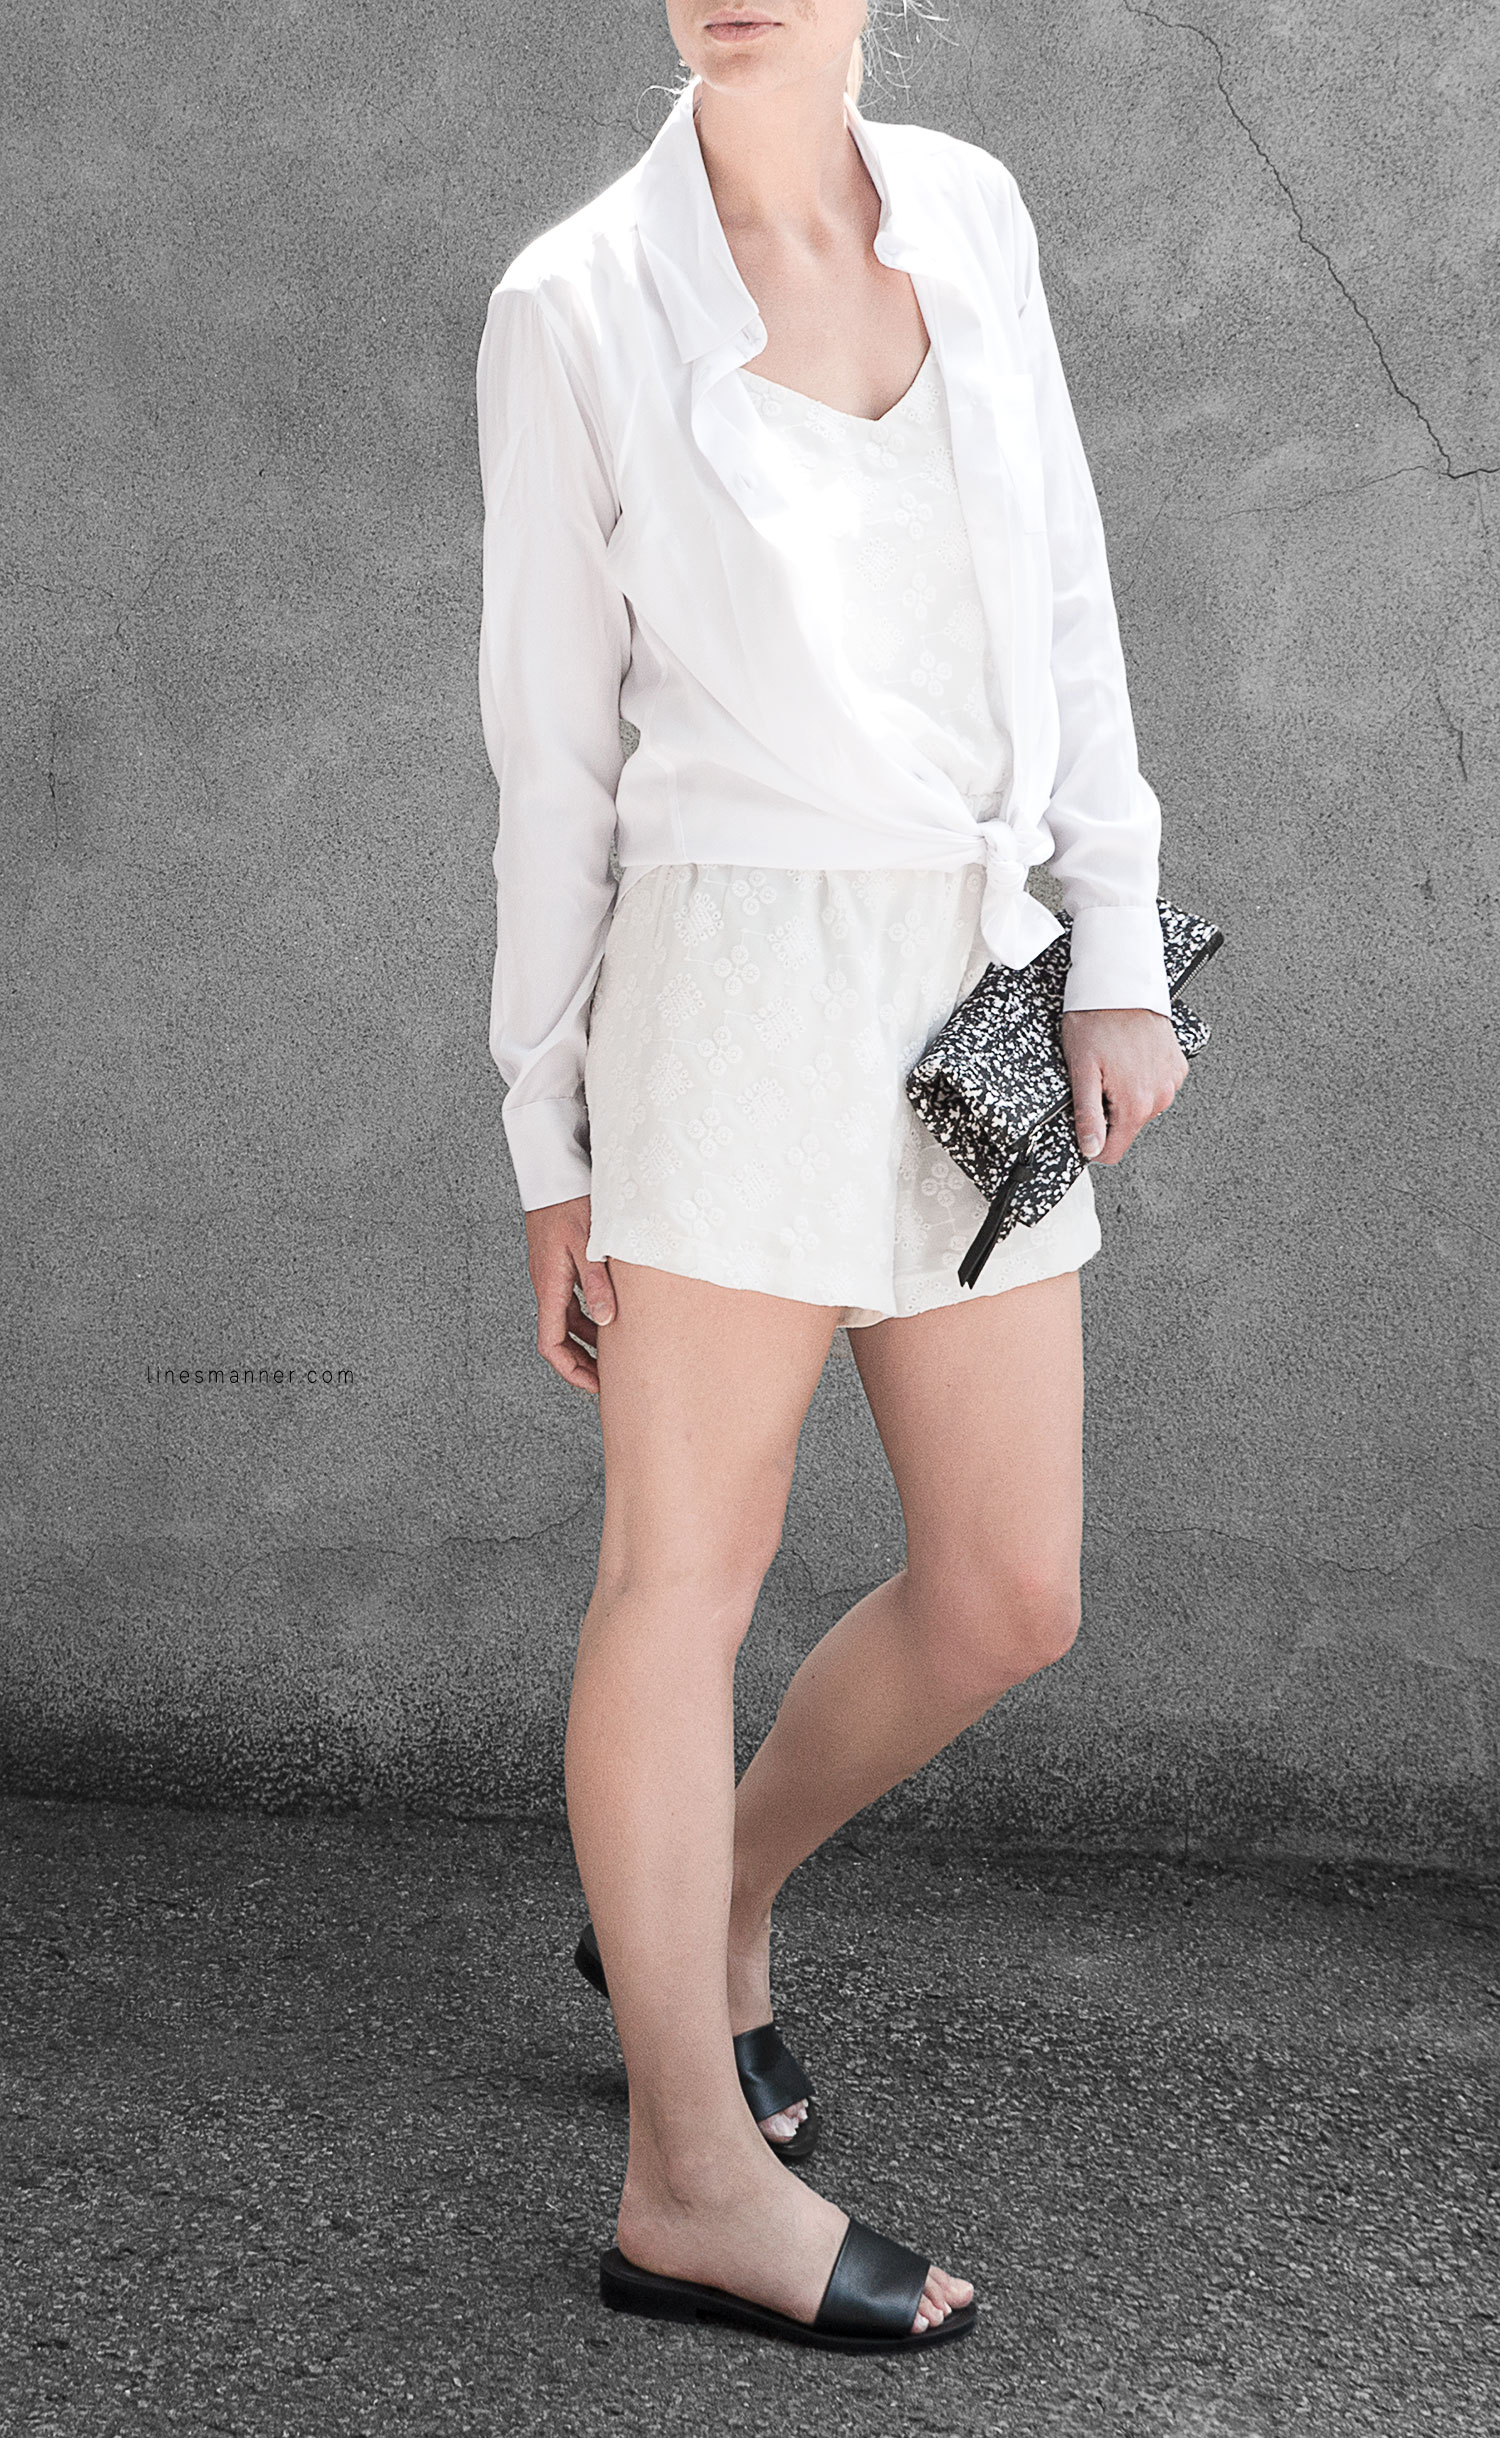 Lines-Manner-Whites-Summer-Essentials-Details-Fresh-Handmade-Aviators-Black_details-Degree-Seven-Simplicity-5